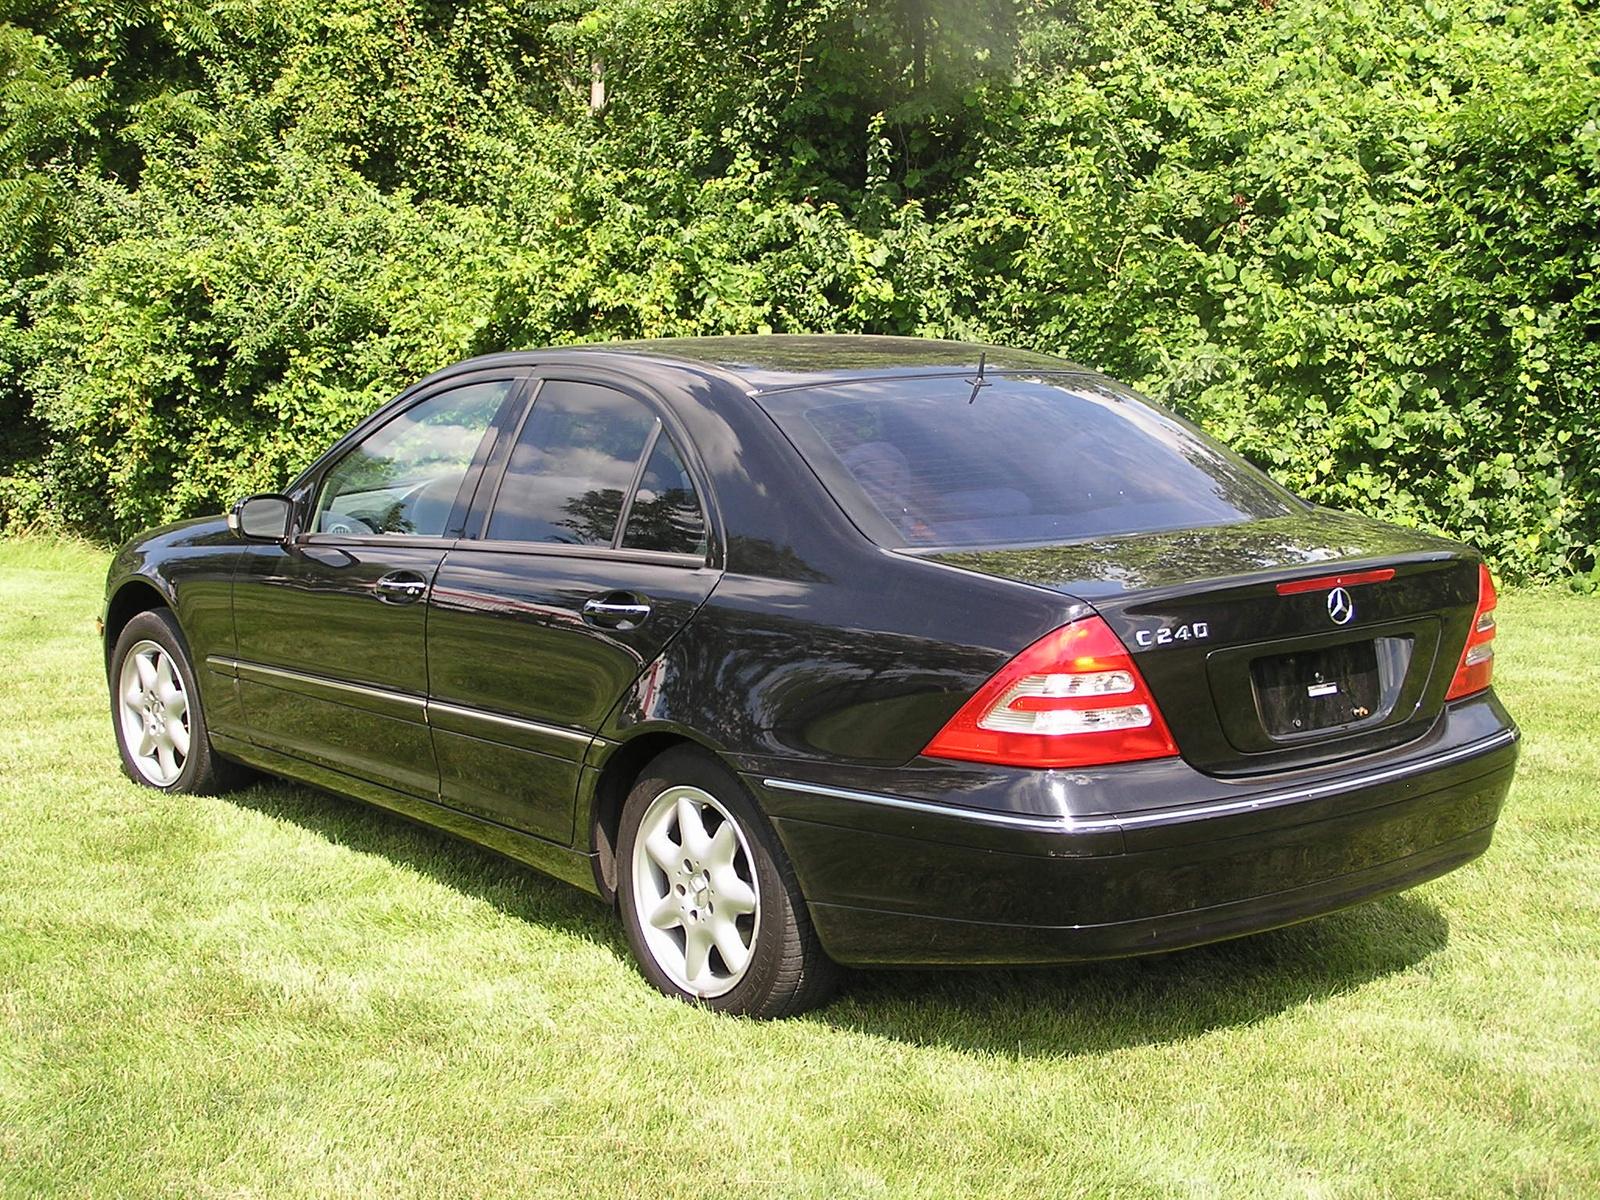 2002 mercedes benz c class exterior pictures cargurus for 2002 mercedes benz c class sedan